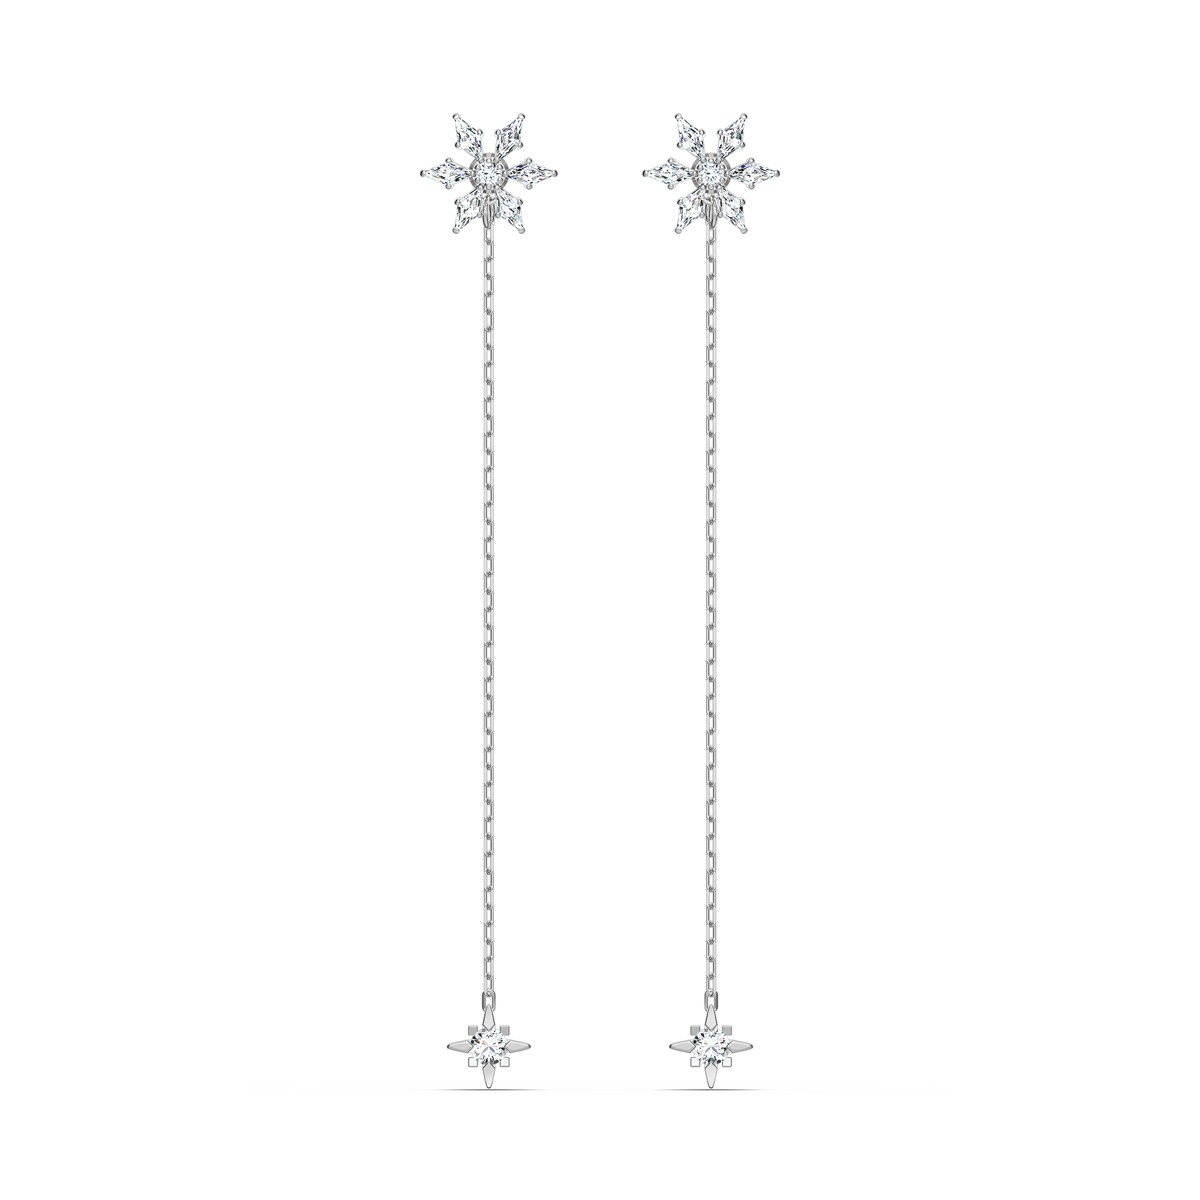 Swarovski Magic Chain Pierced Earrings, White, Rhodium Plated